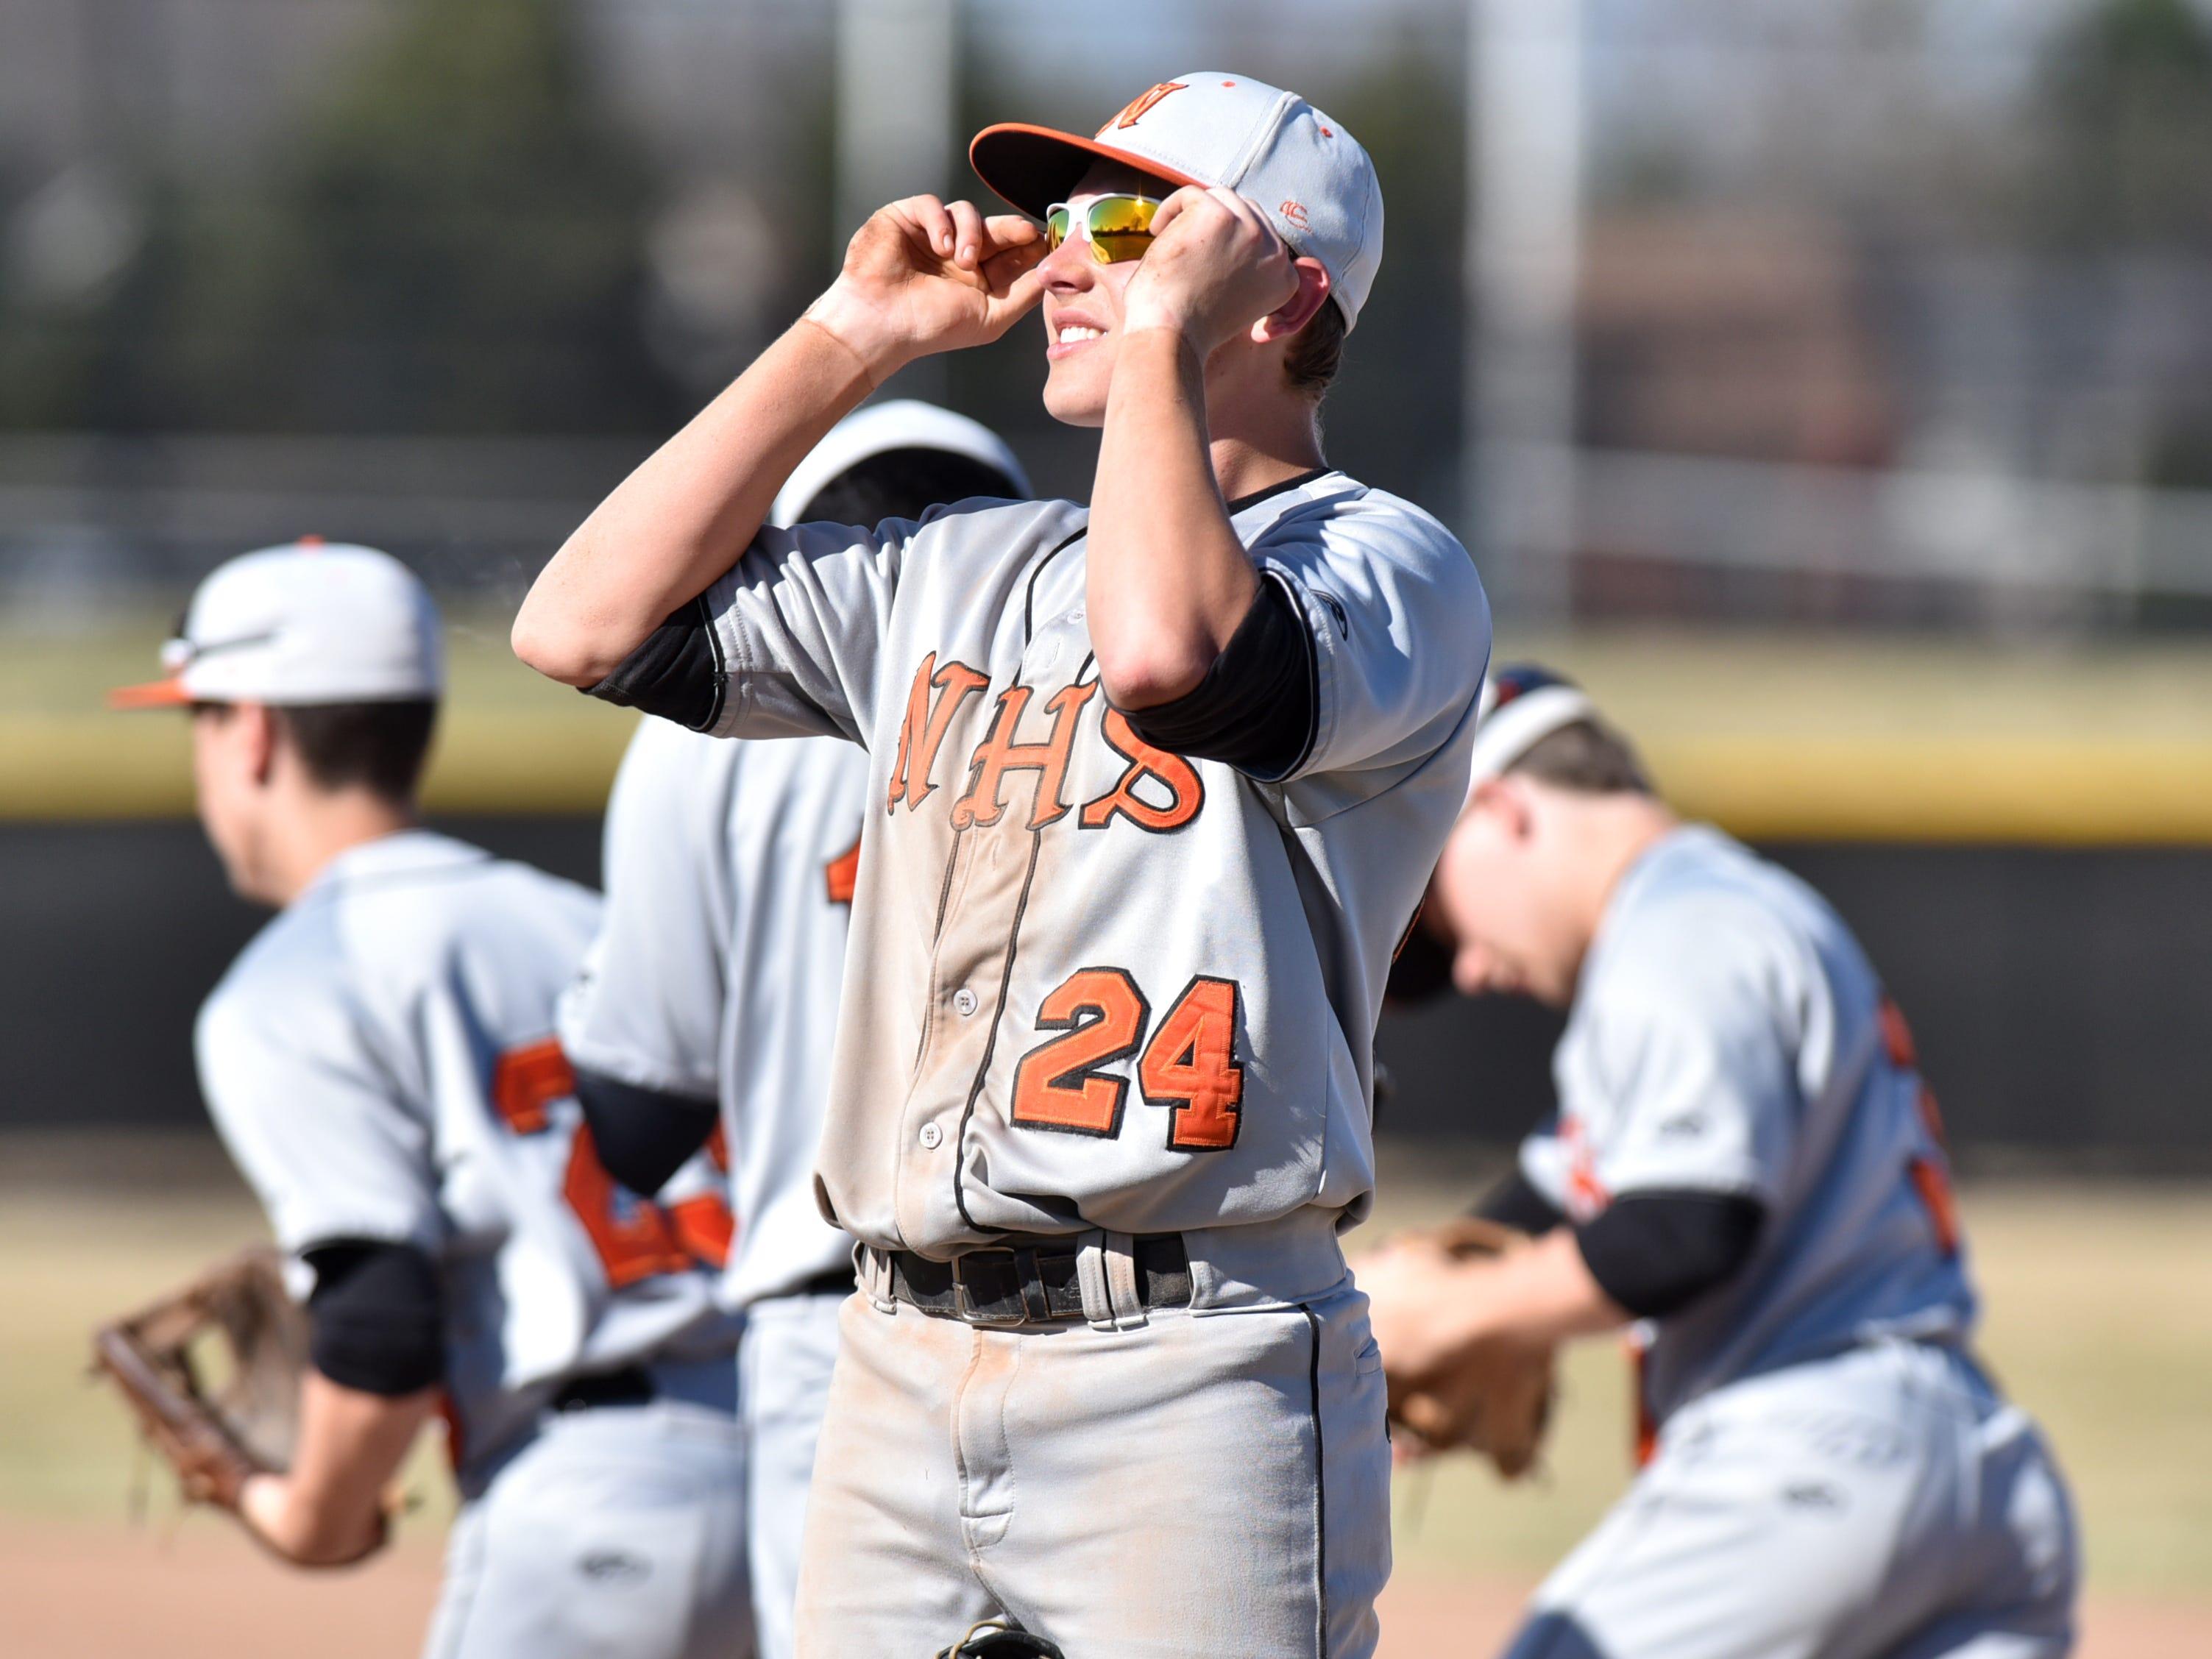 Northville Mustang Nolen Dingledey adjusts his sunglasses before beginning another inning.